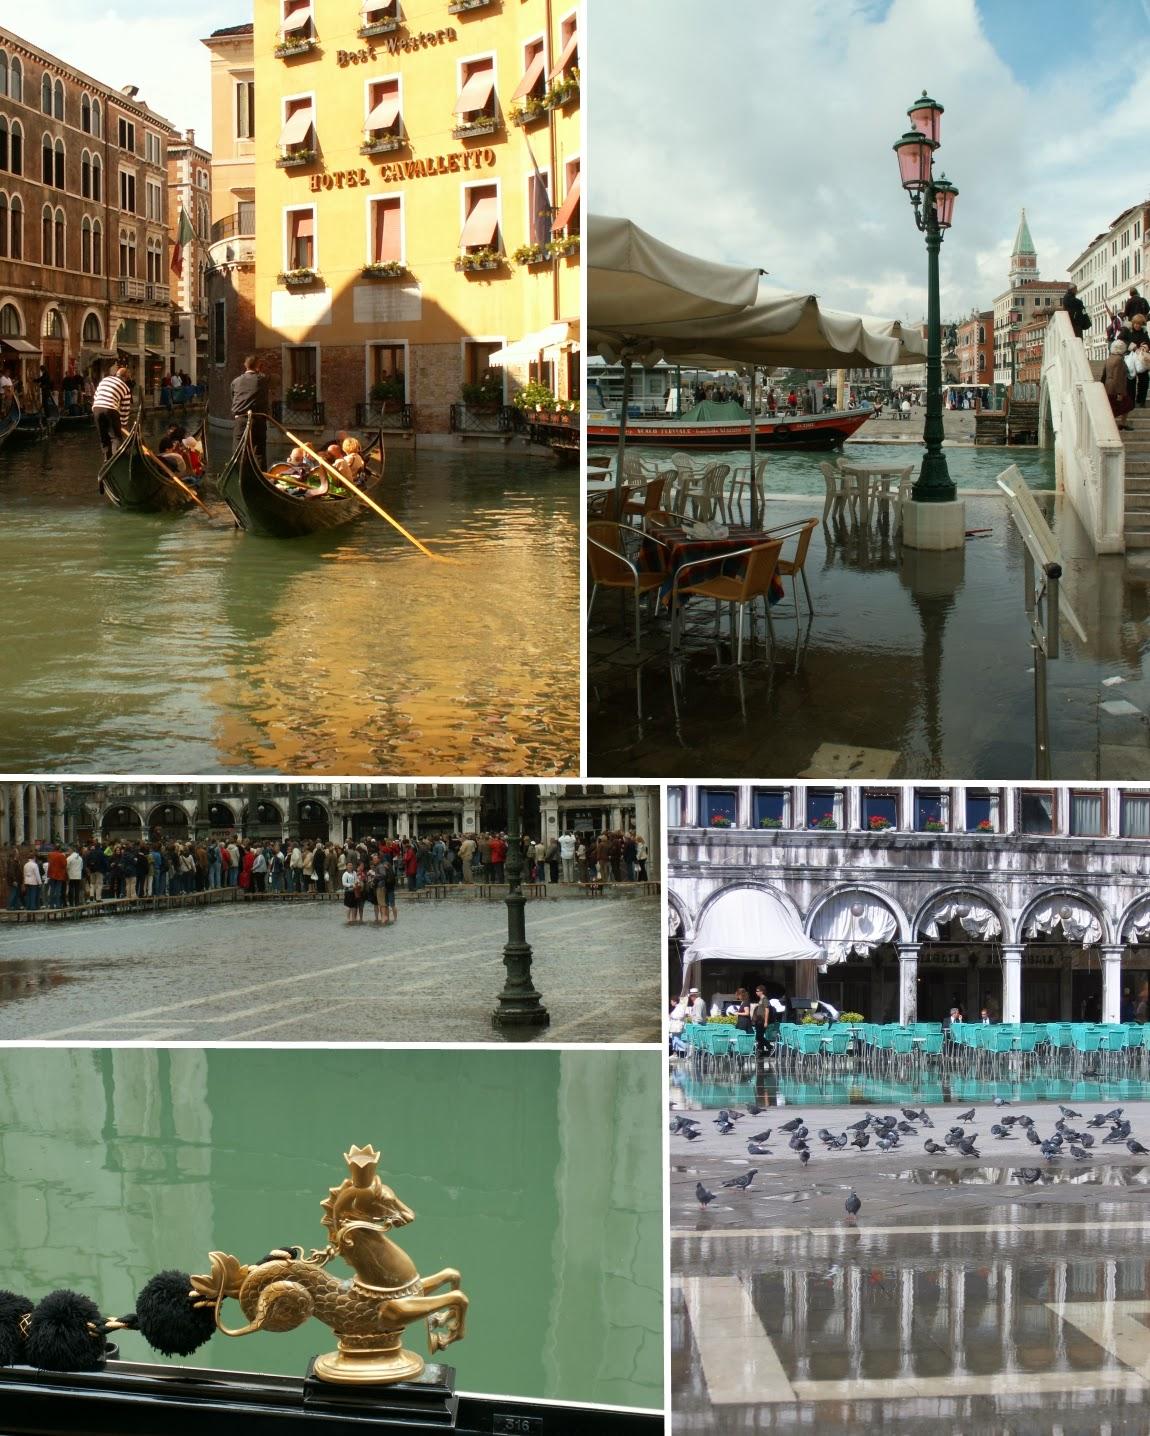 Venice Venezia flood gondola bank Plazza